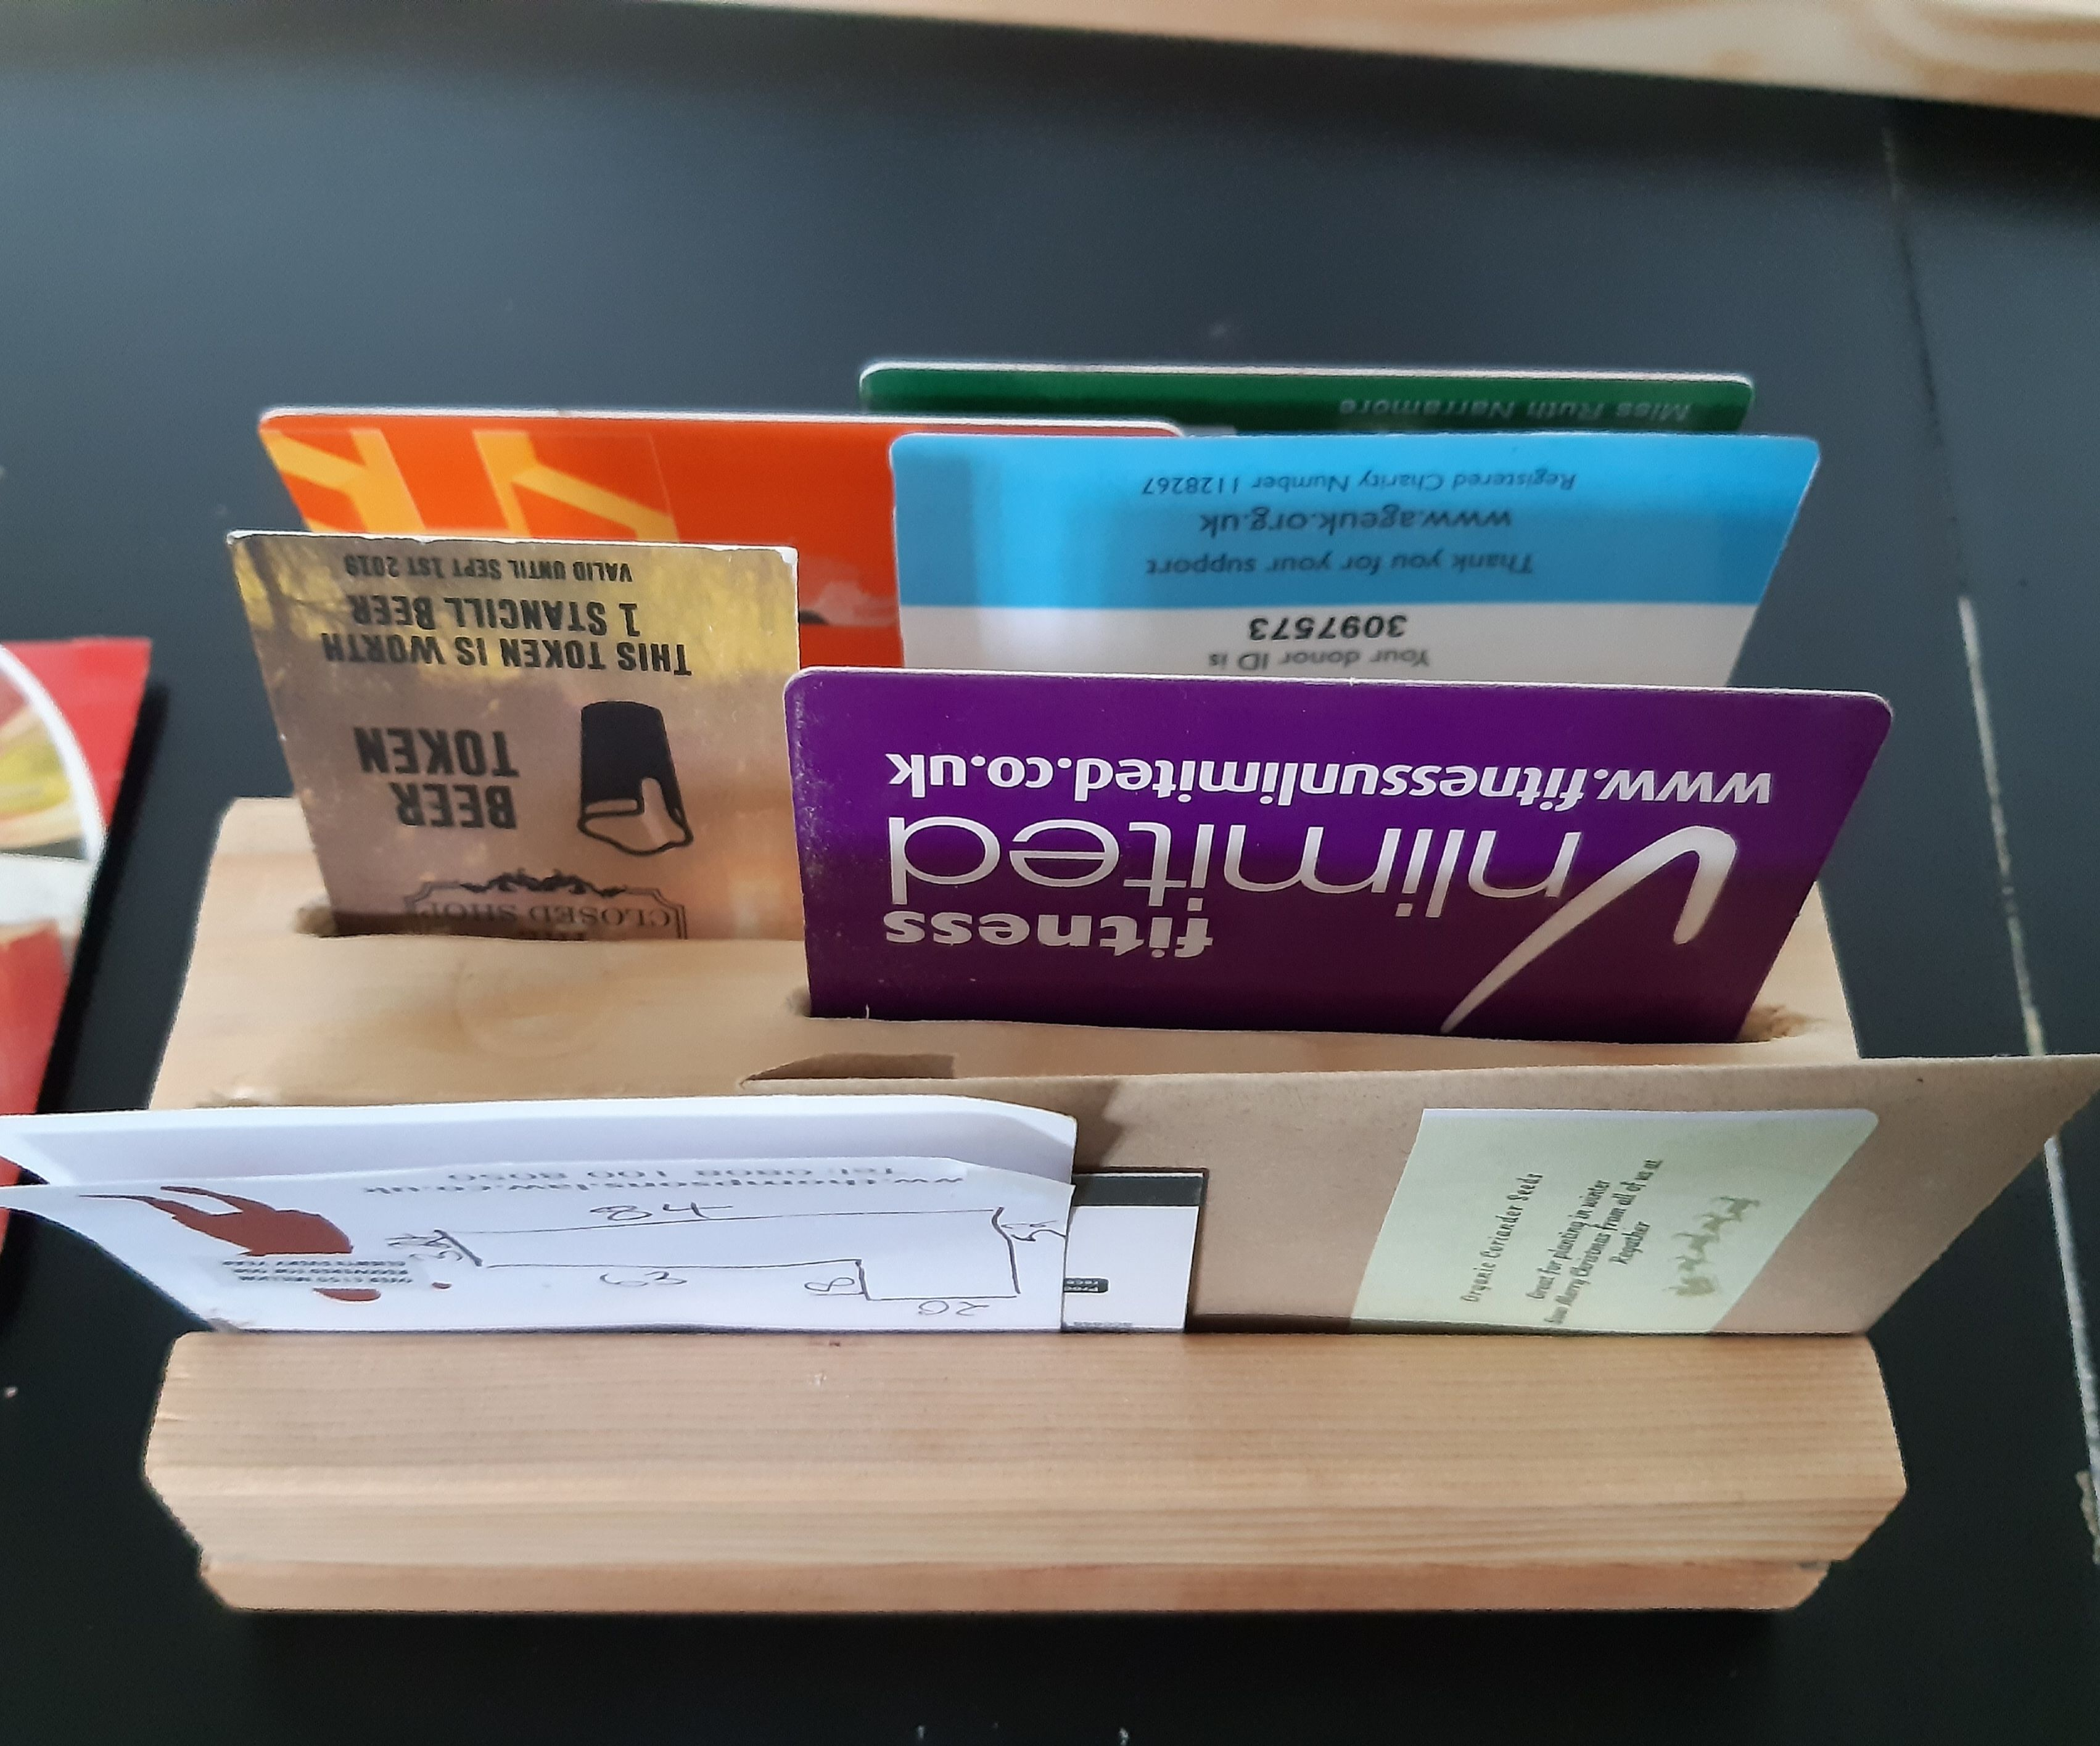 Upcycled Wood Card Holder